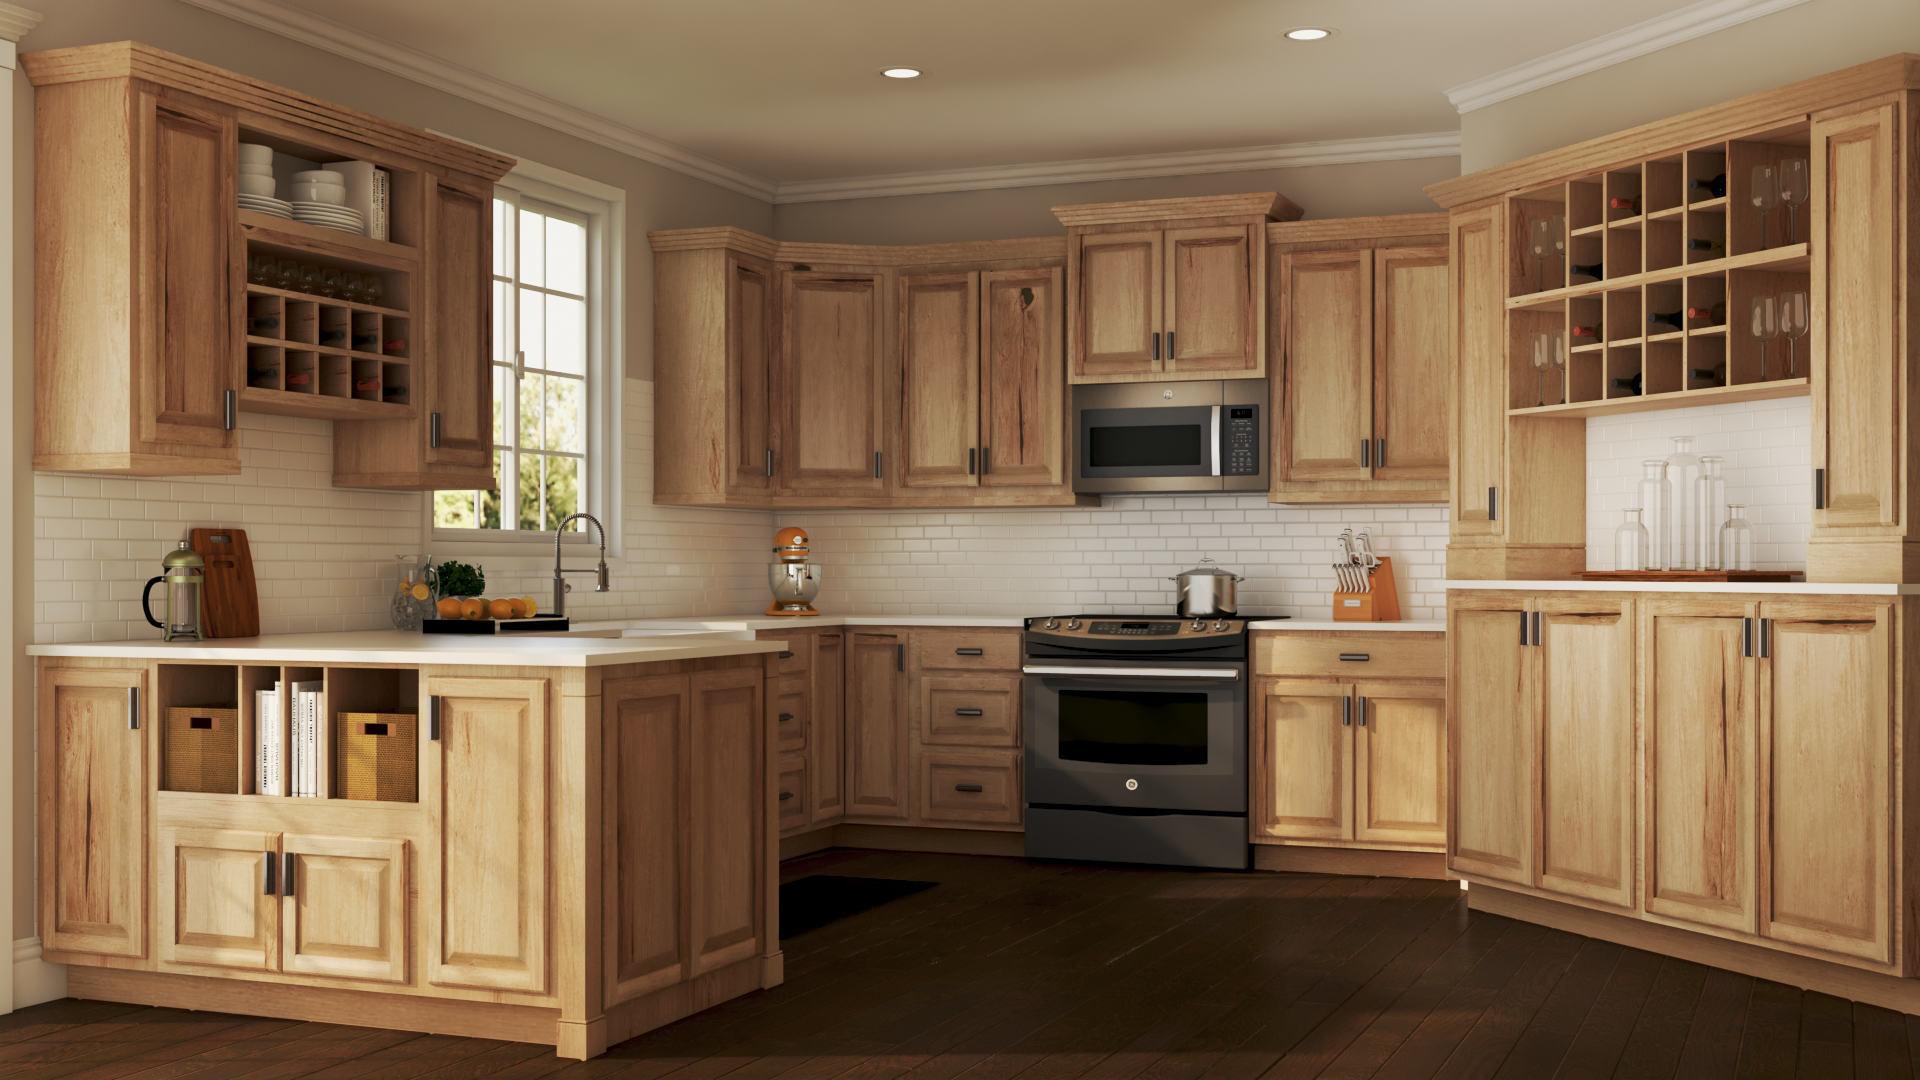 Hampton Bath Cabinets In Natural Hickory